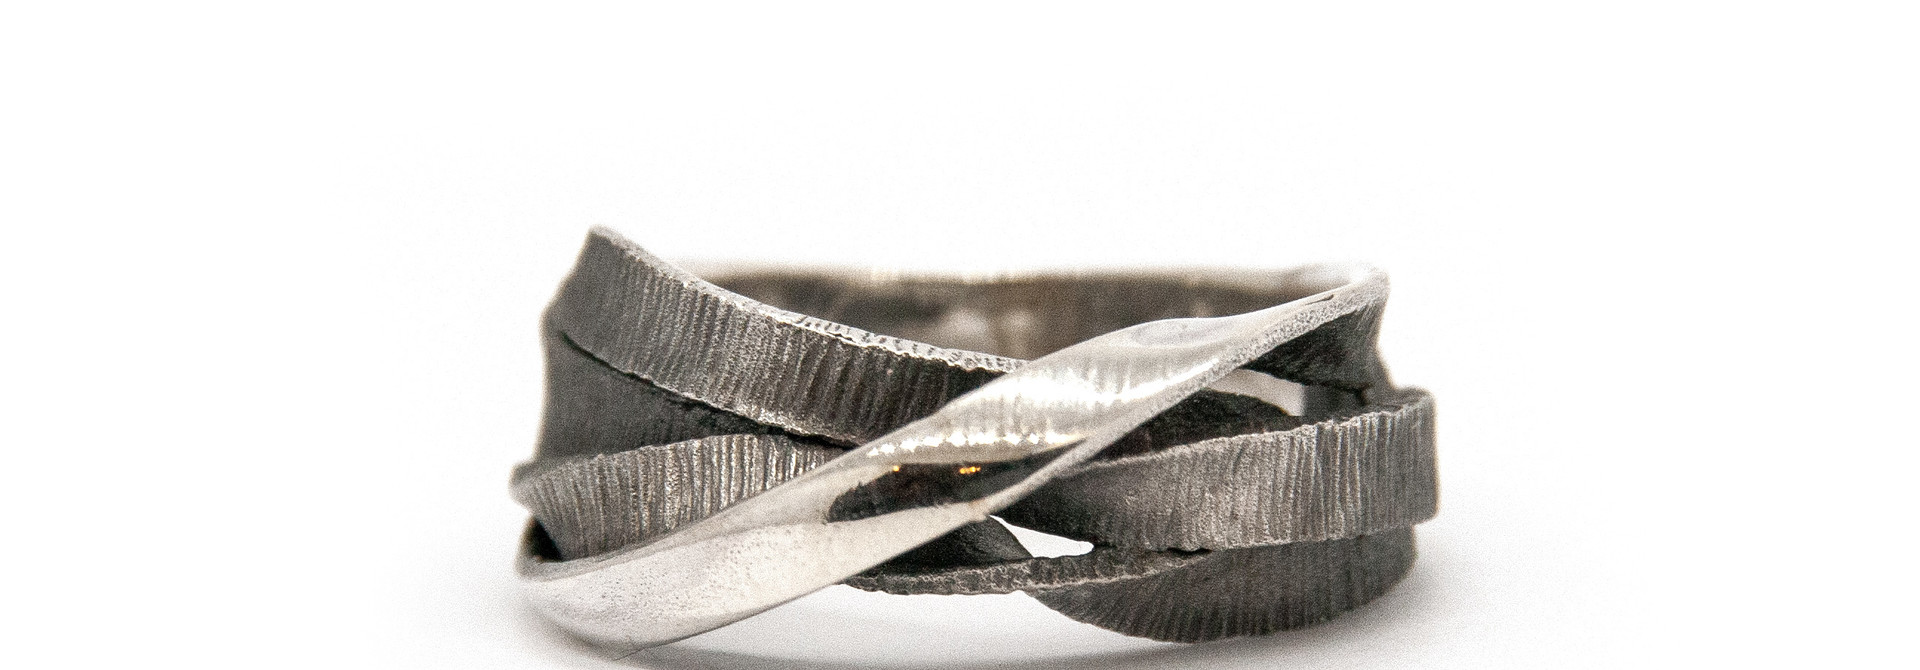 Moebius 3+1 ring